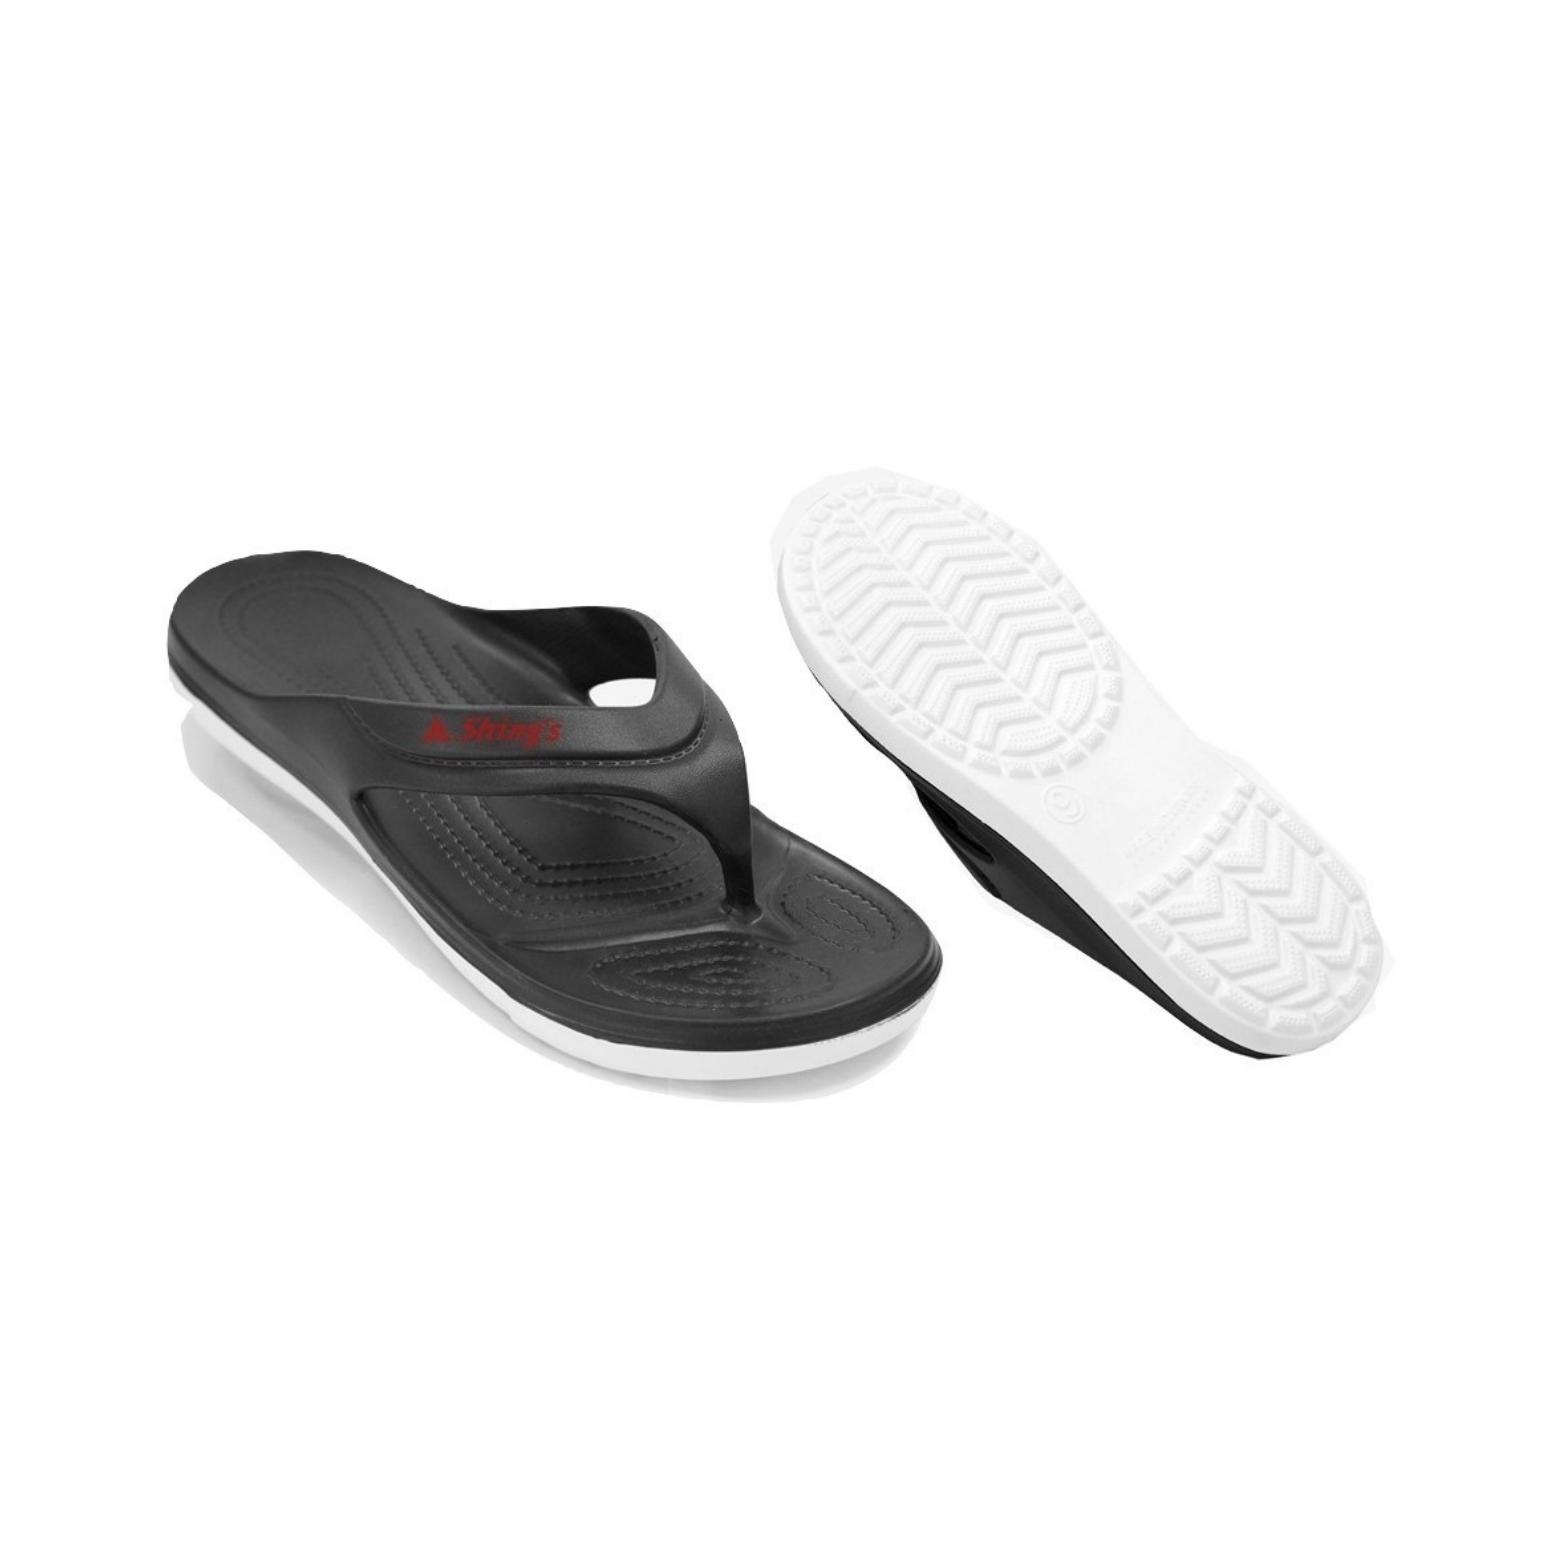 47426b49112b made in Taiwan products Shing s men women sport sponge thong sandal custom  logo slide sandal